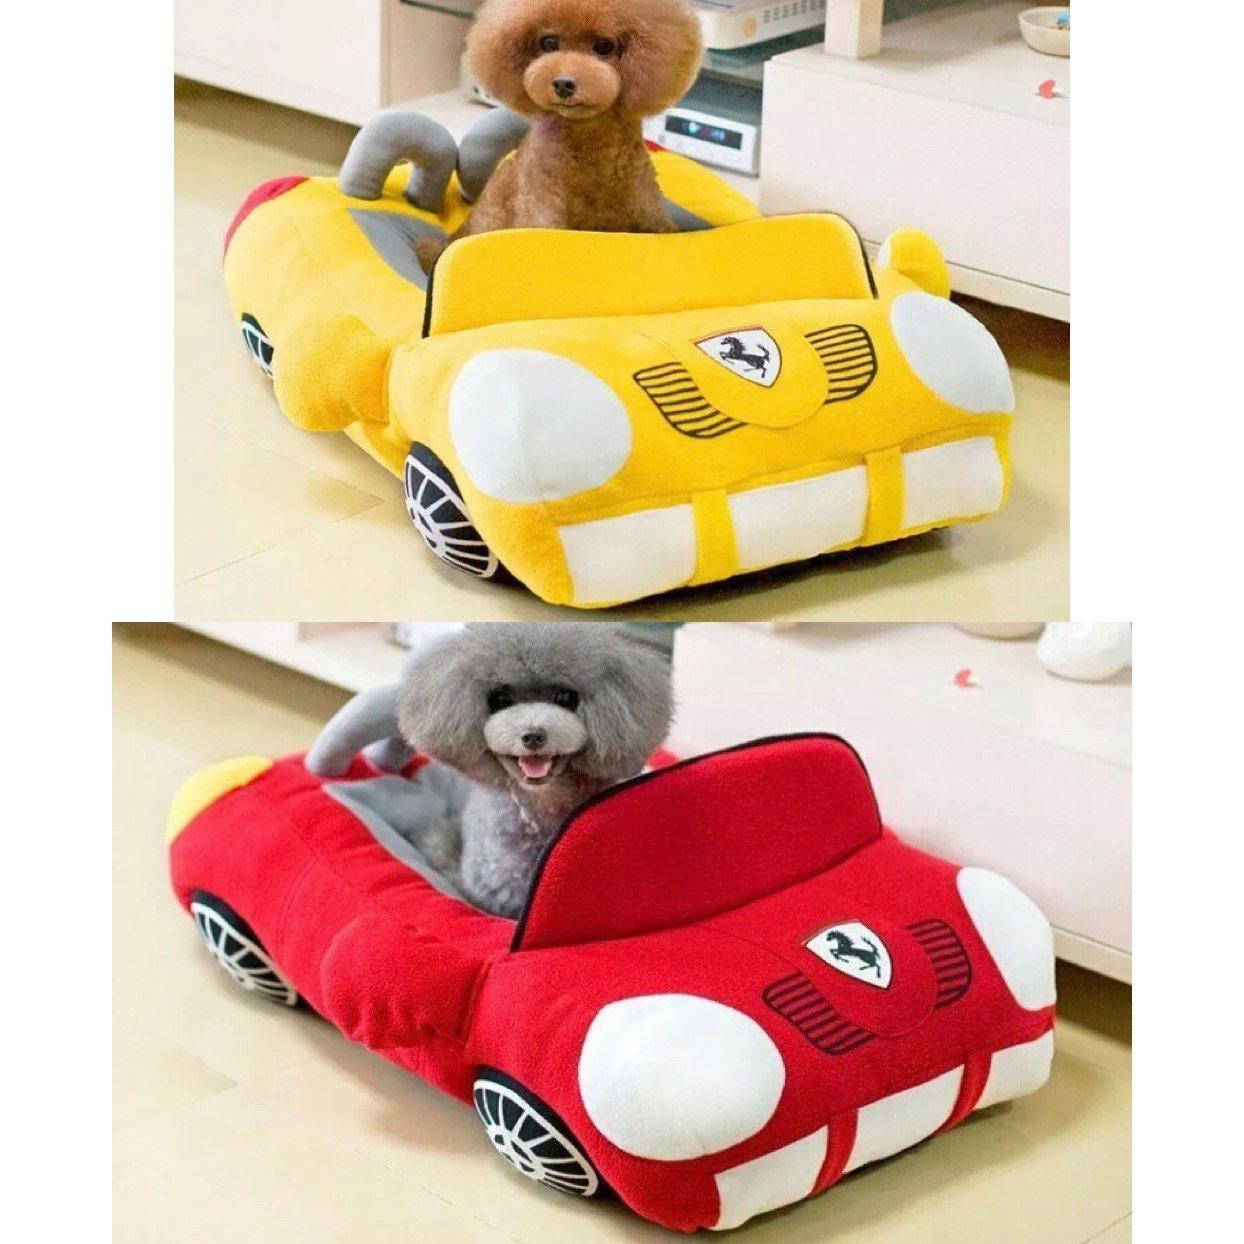 Ferrari Sports Car Shape Pet Bed House Nest Puppy Dog Cat Plush Kennel Sleep Cushion Animal Bedding